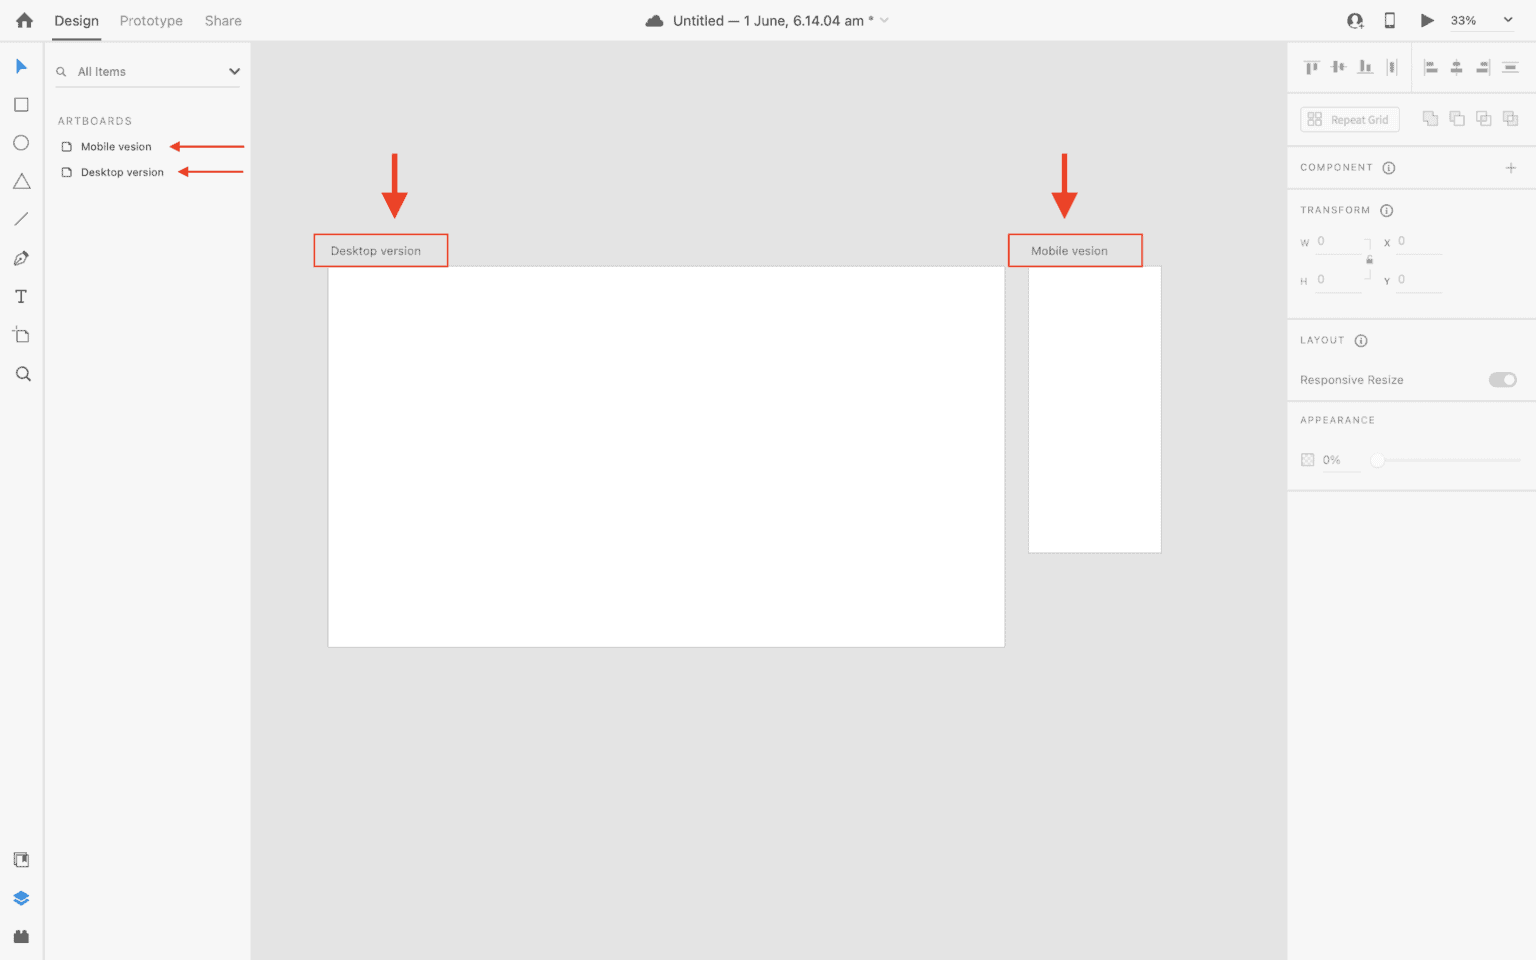 Rename artobards in Adobe XD to make more sense